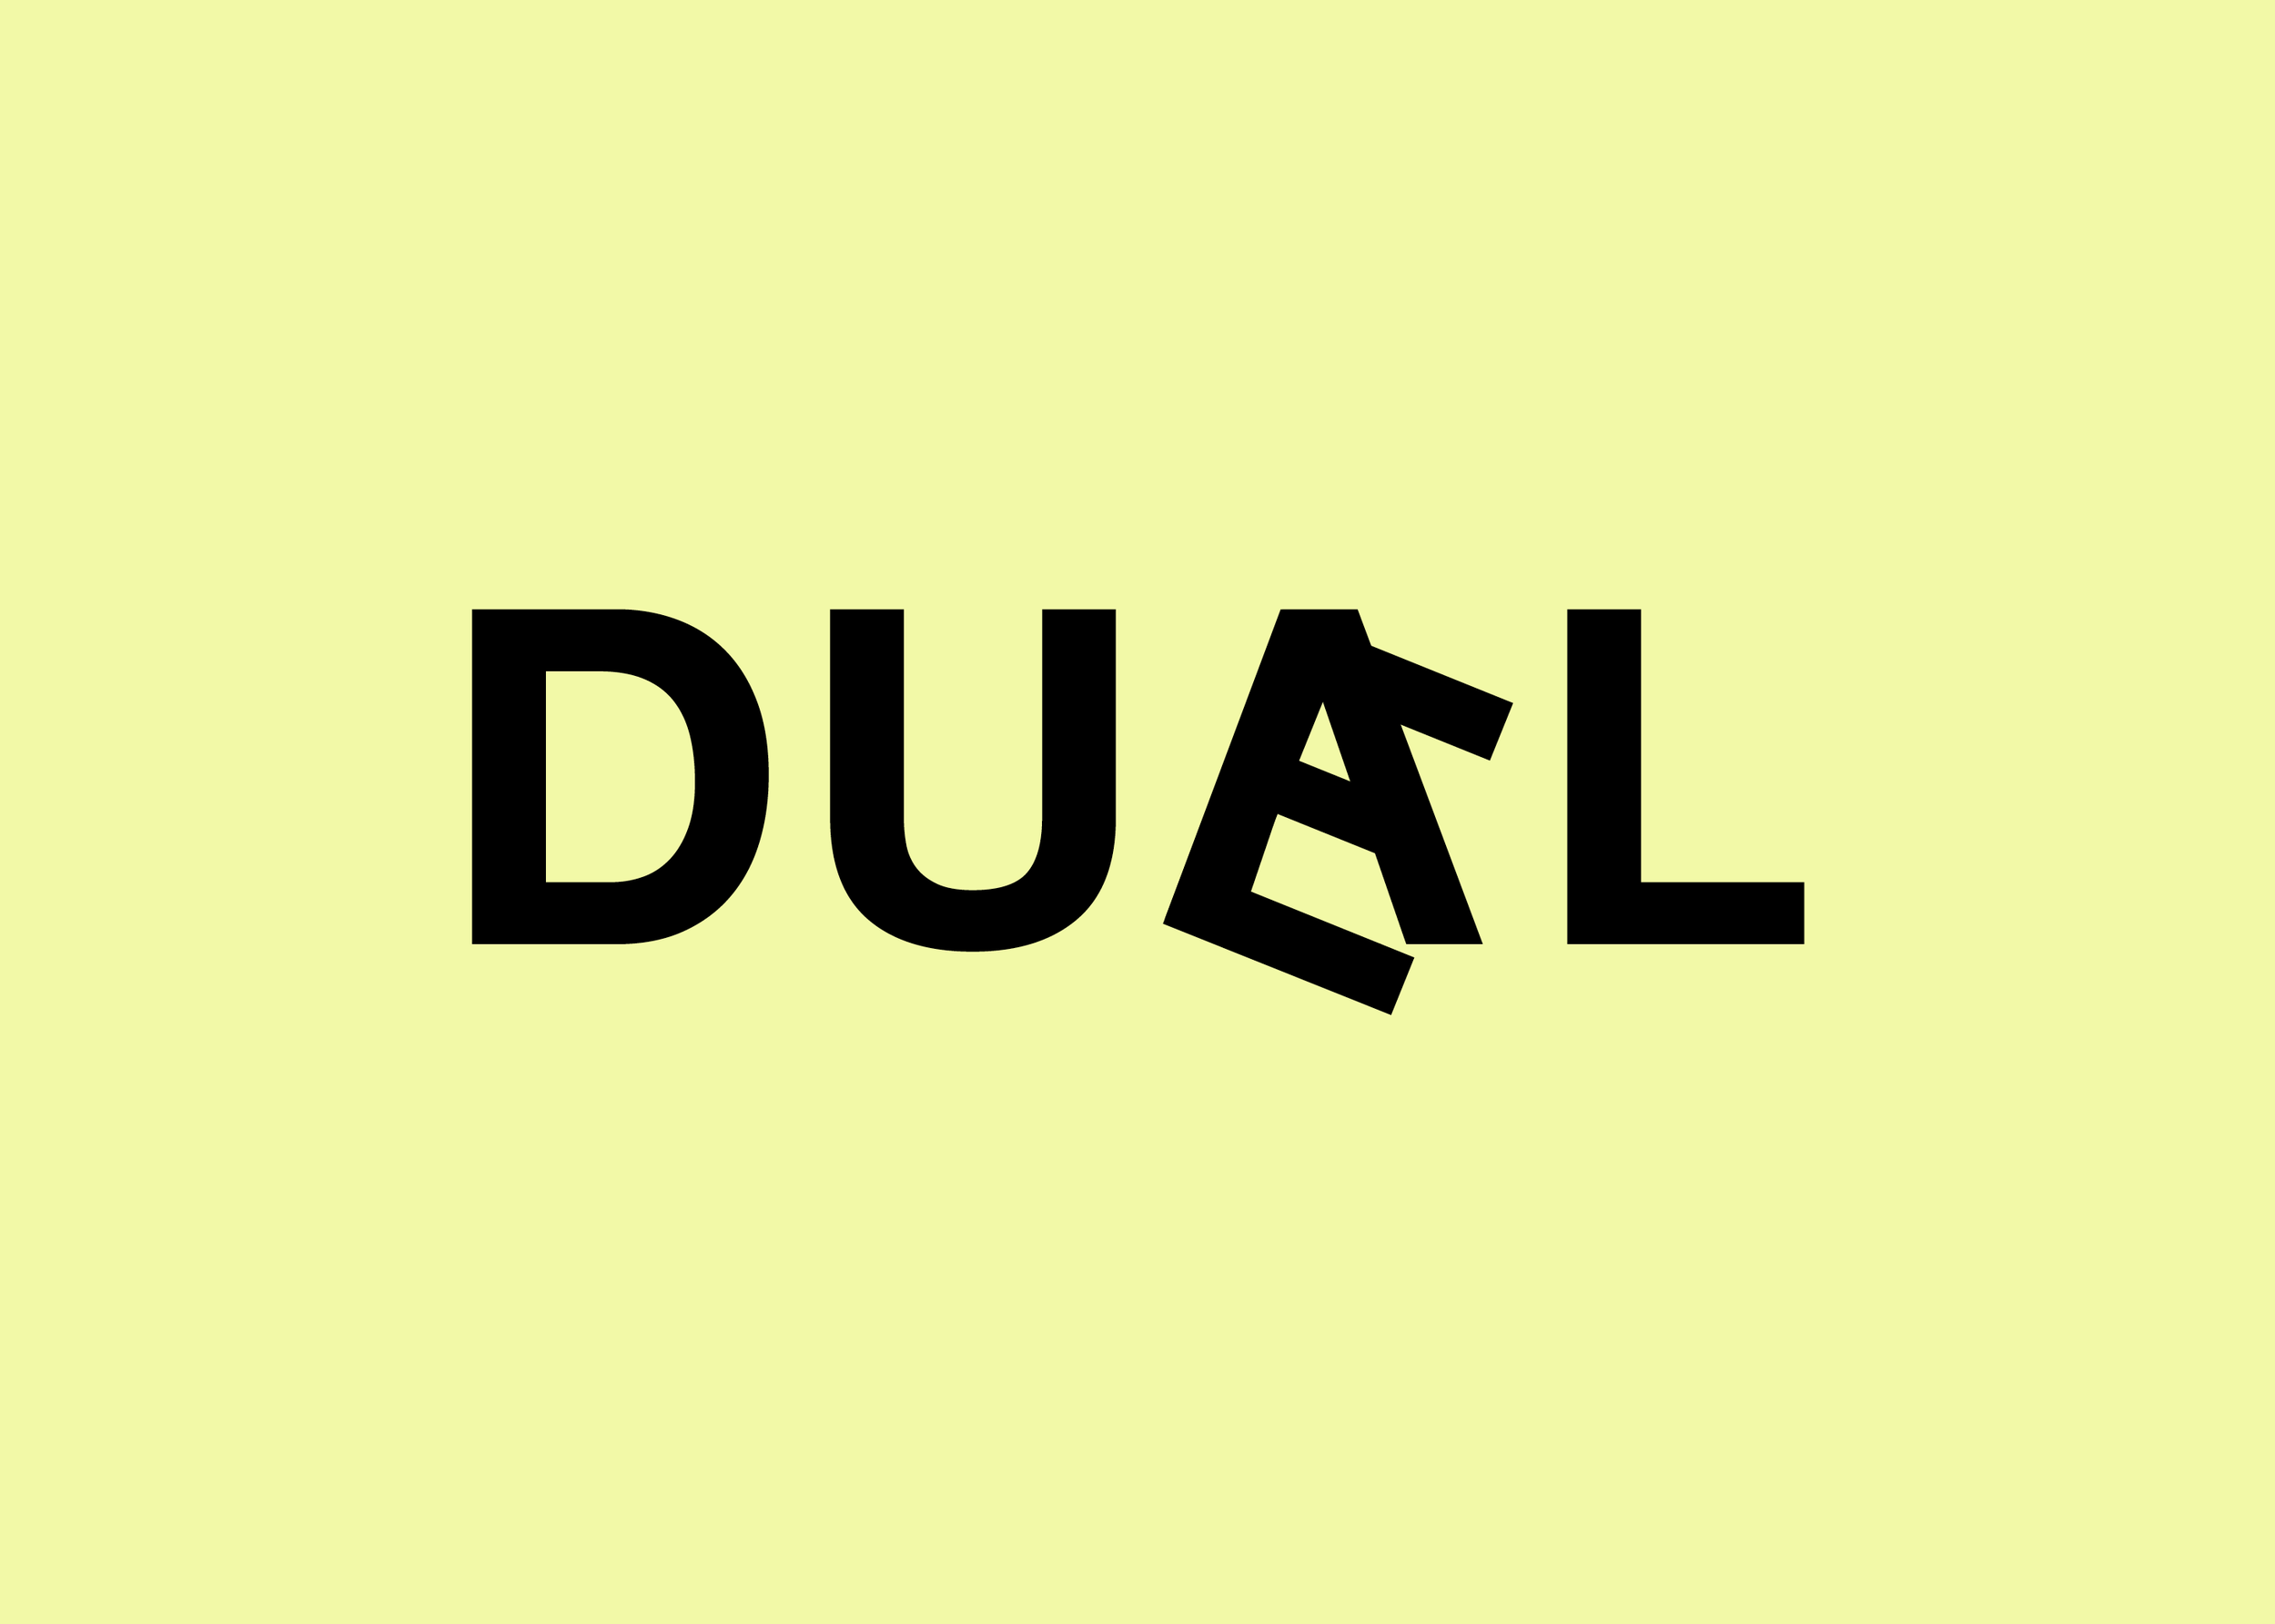 duael_flip13.png